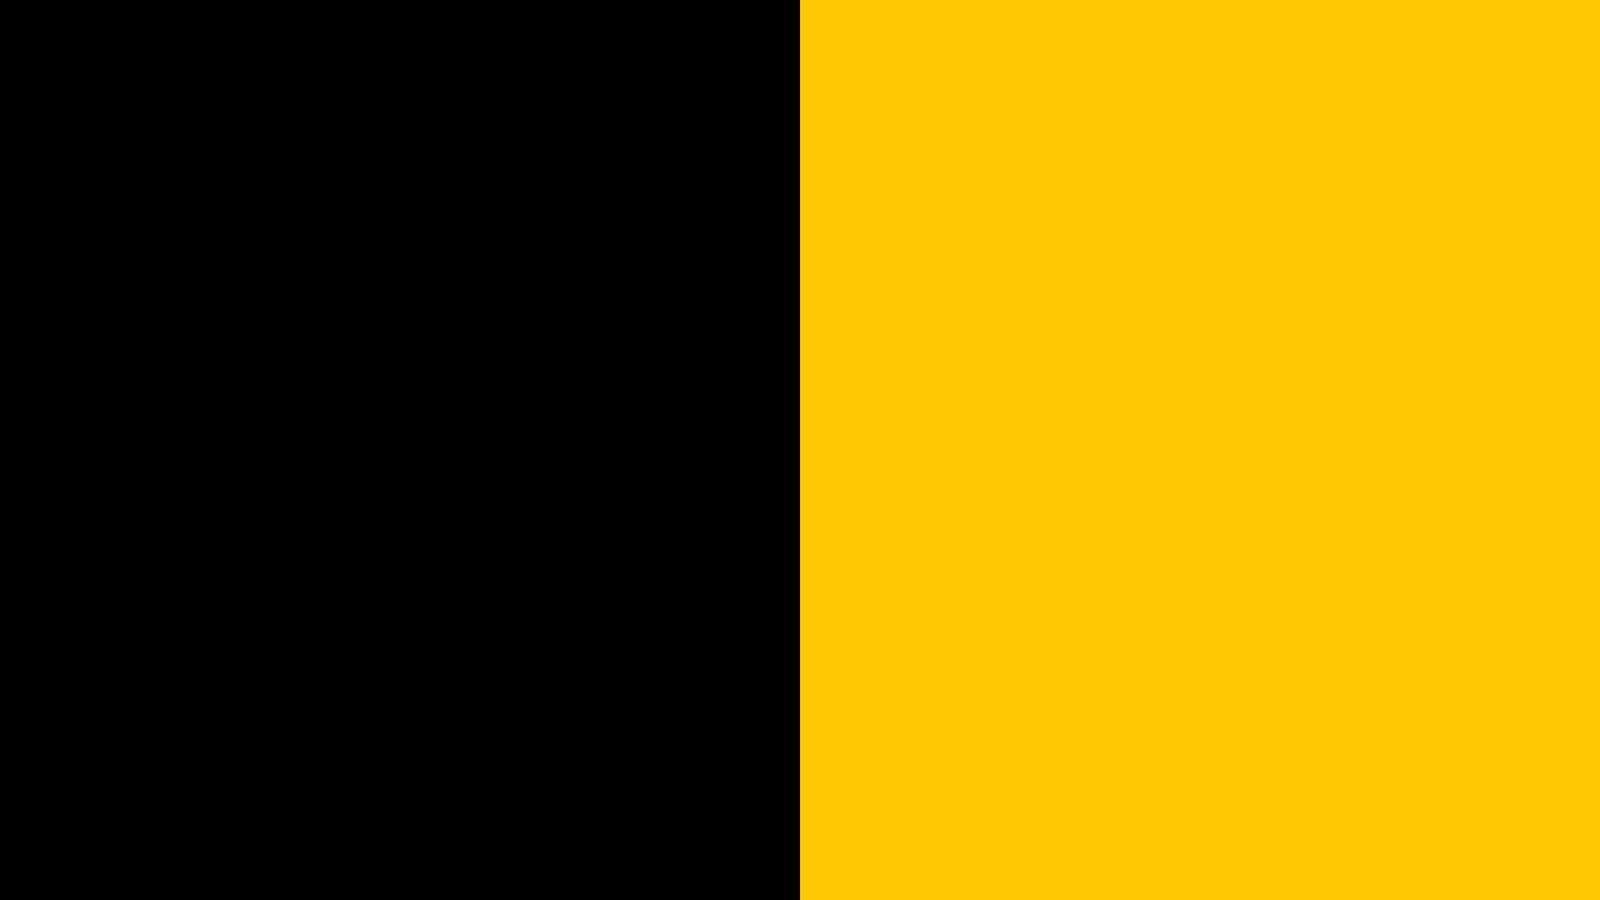 Grafik - Koalition Flagge - Schwarz-Gelb